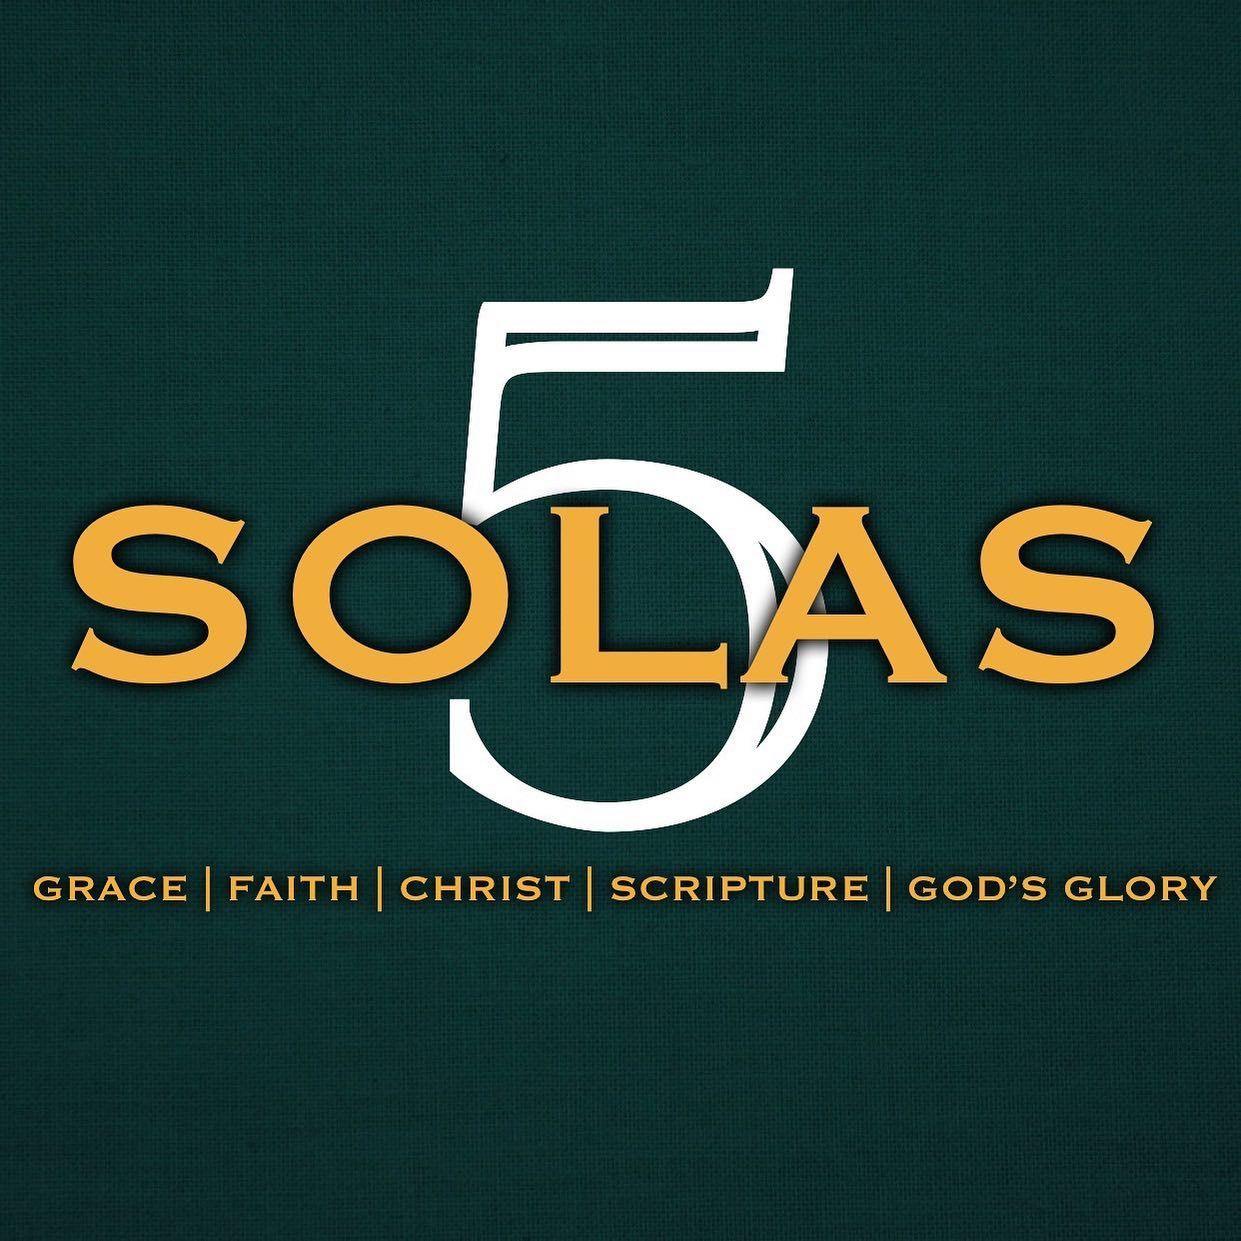 Sola Gratia - Grace Alone